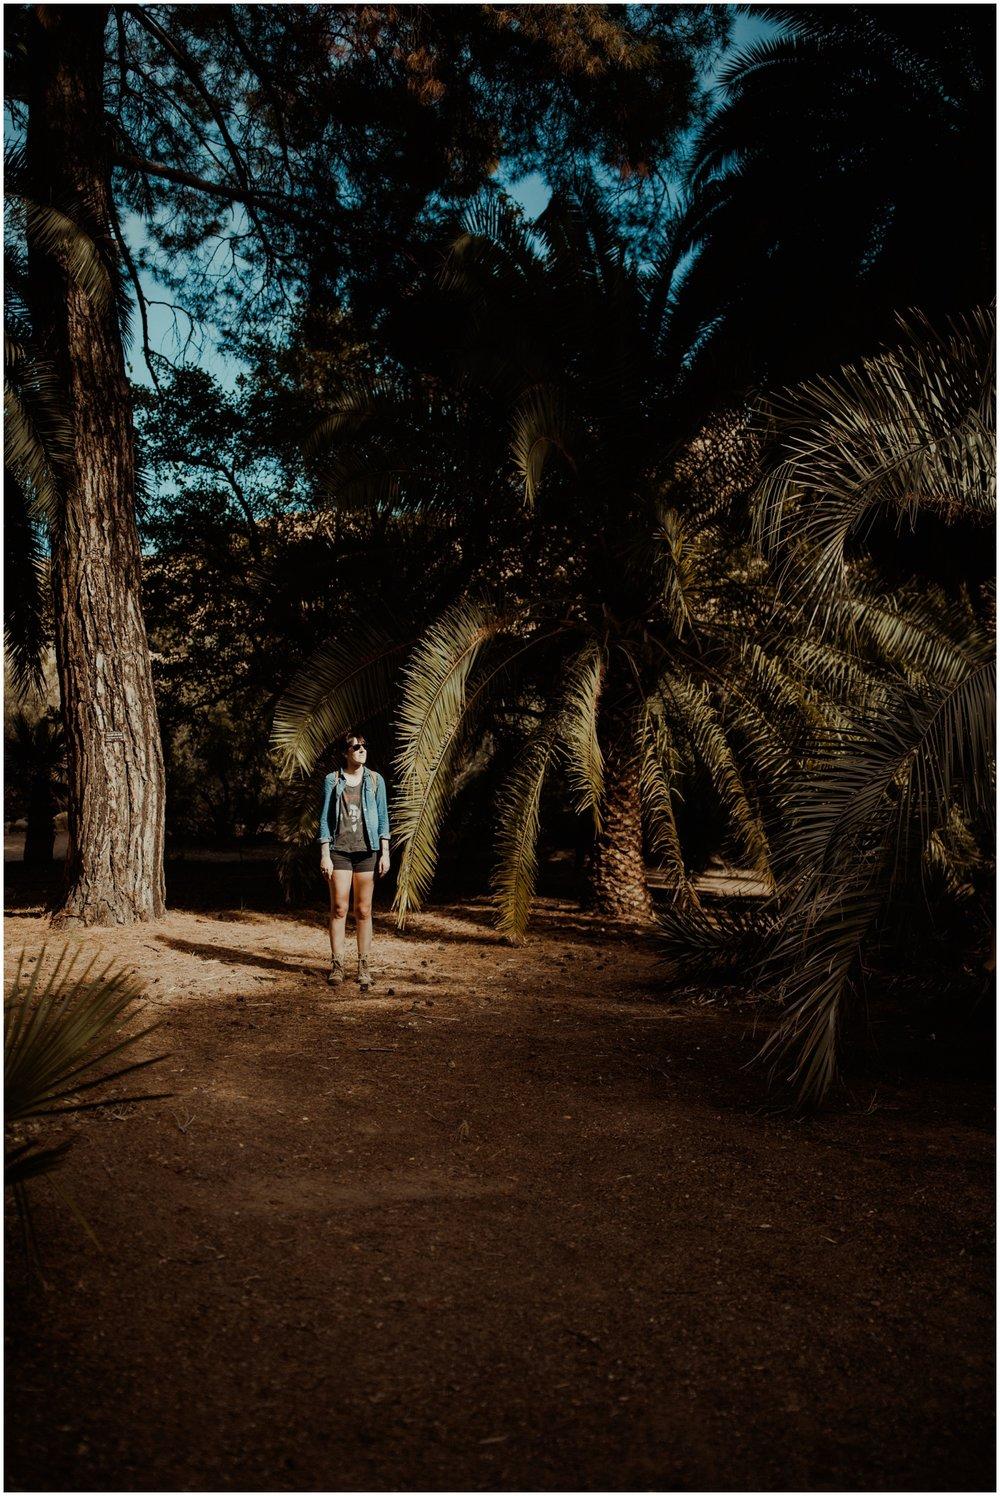 phoenix-lifestyle-photographer-trip-to-boyce-thompson-arboretum_0018.jpg